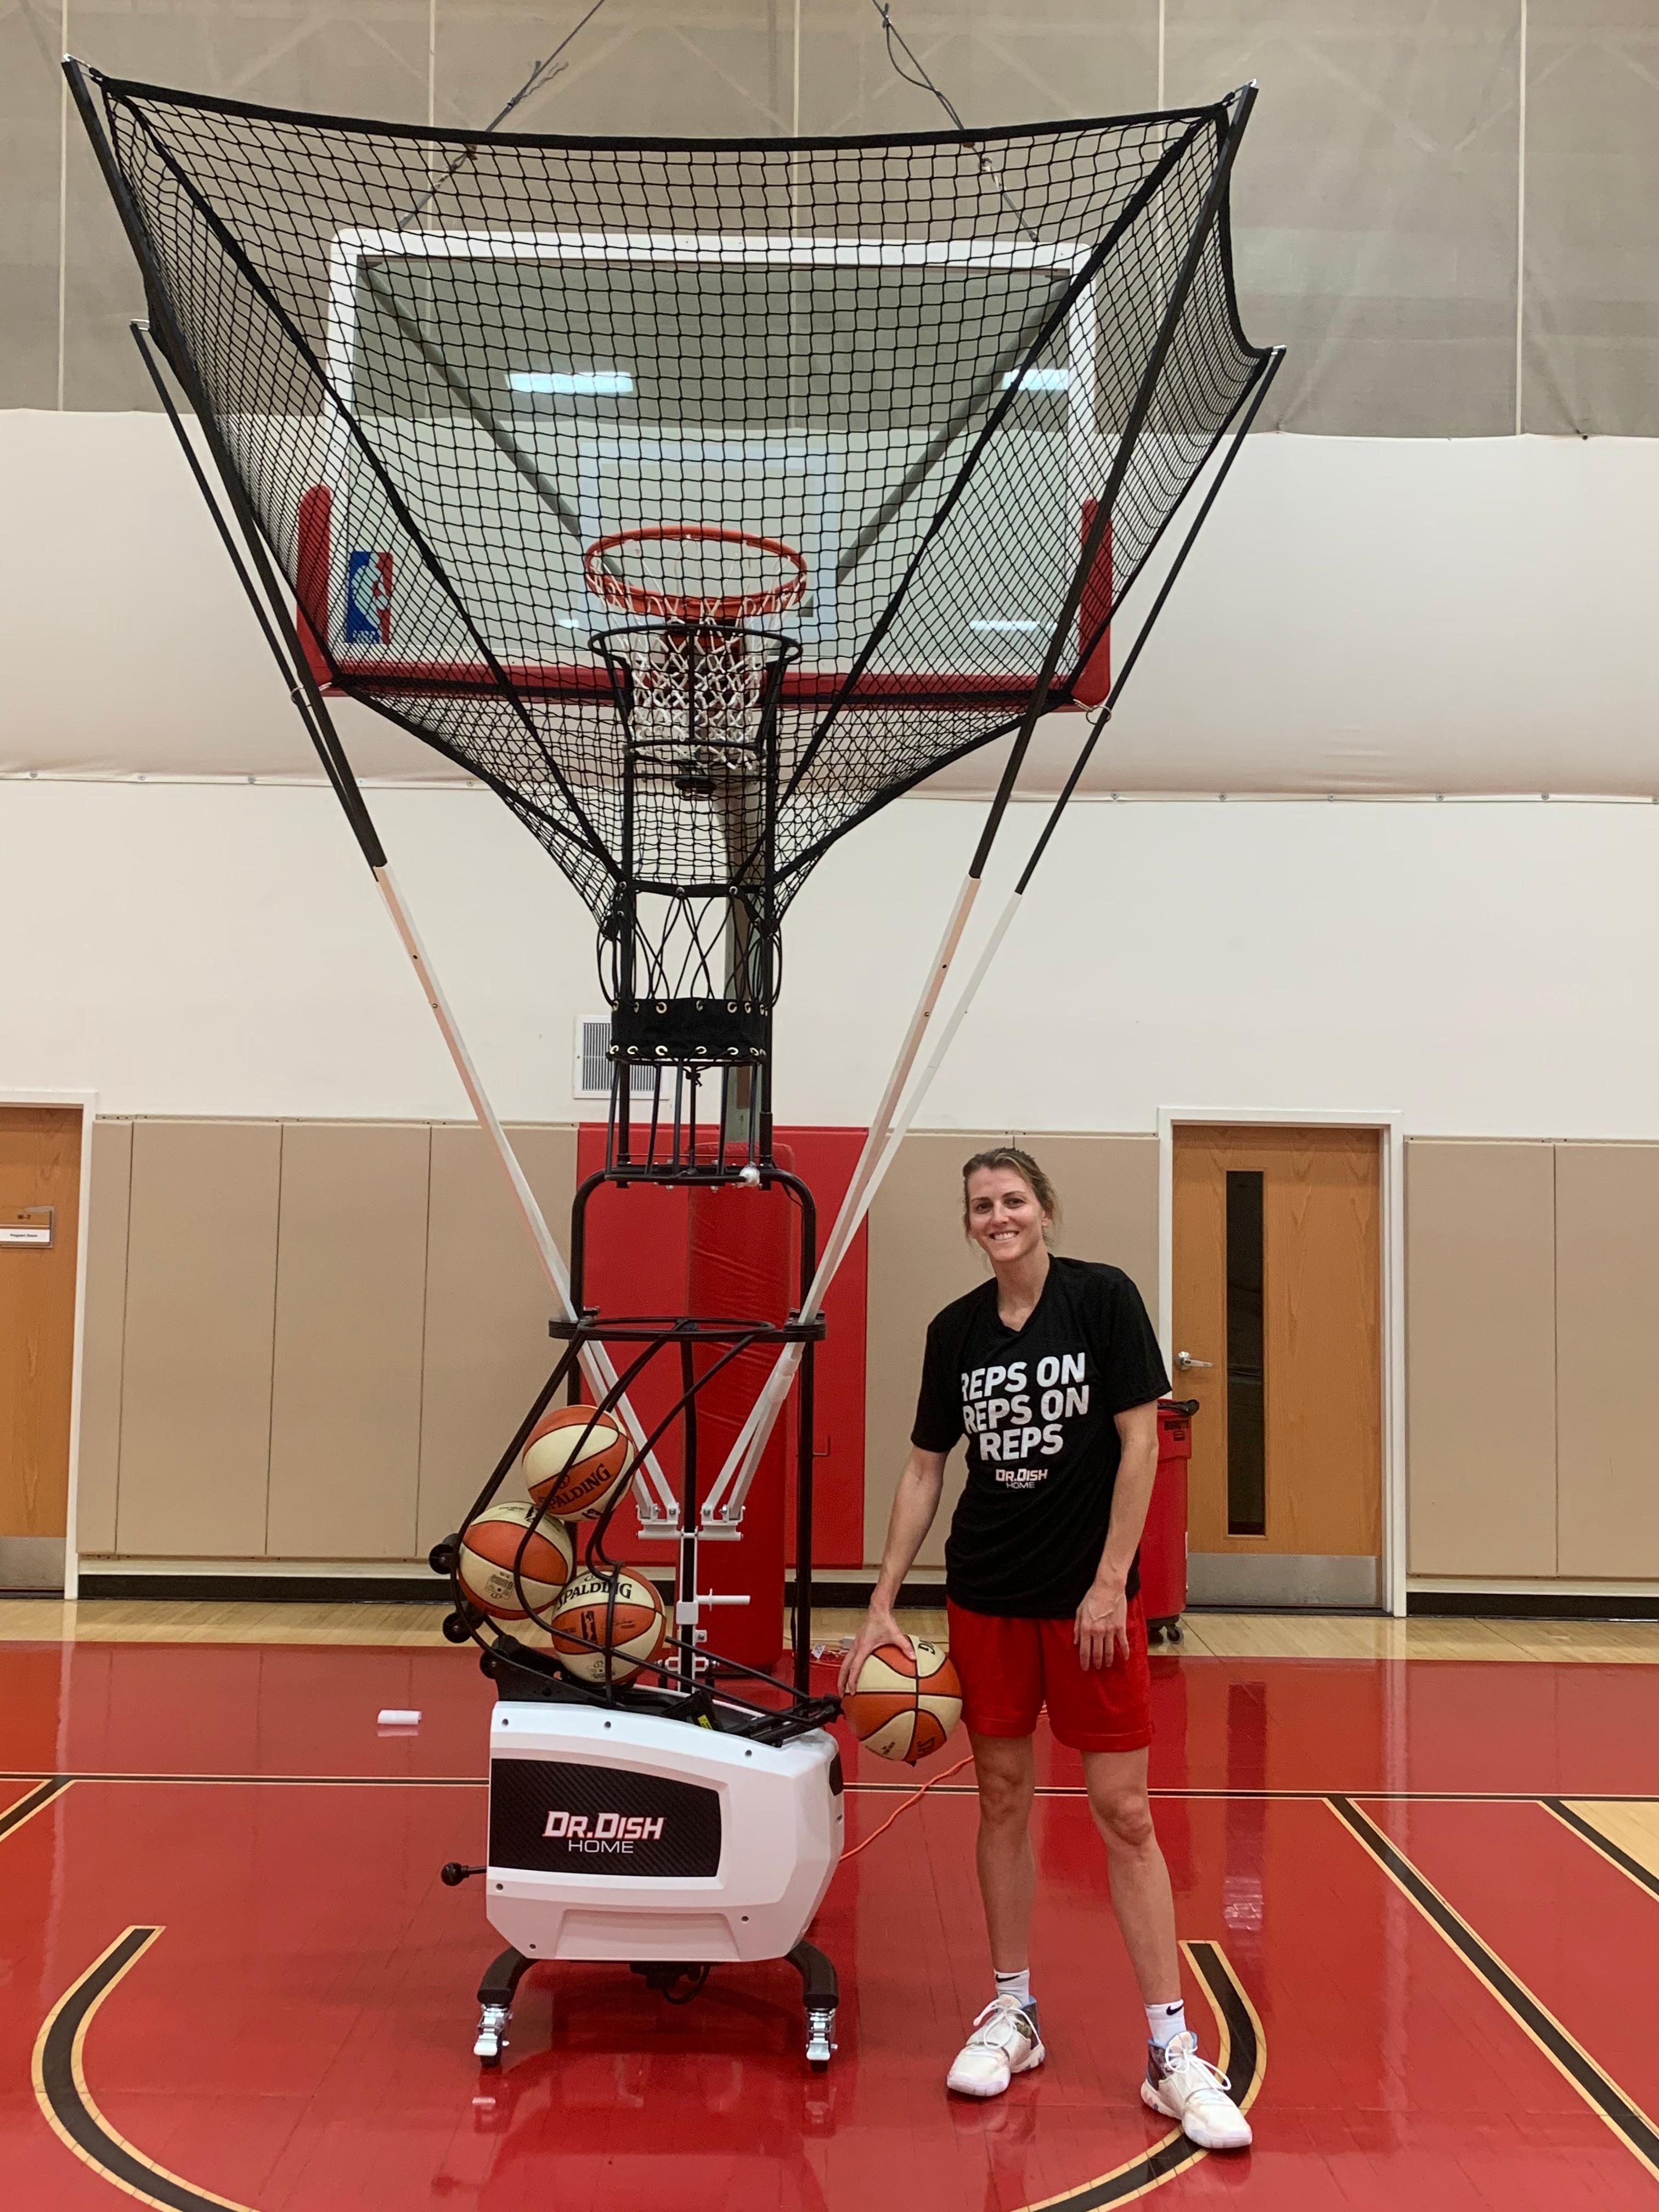 WNBA All-Star Allie Quigley Chooses Dr. Dish